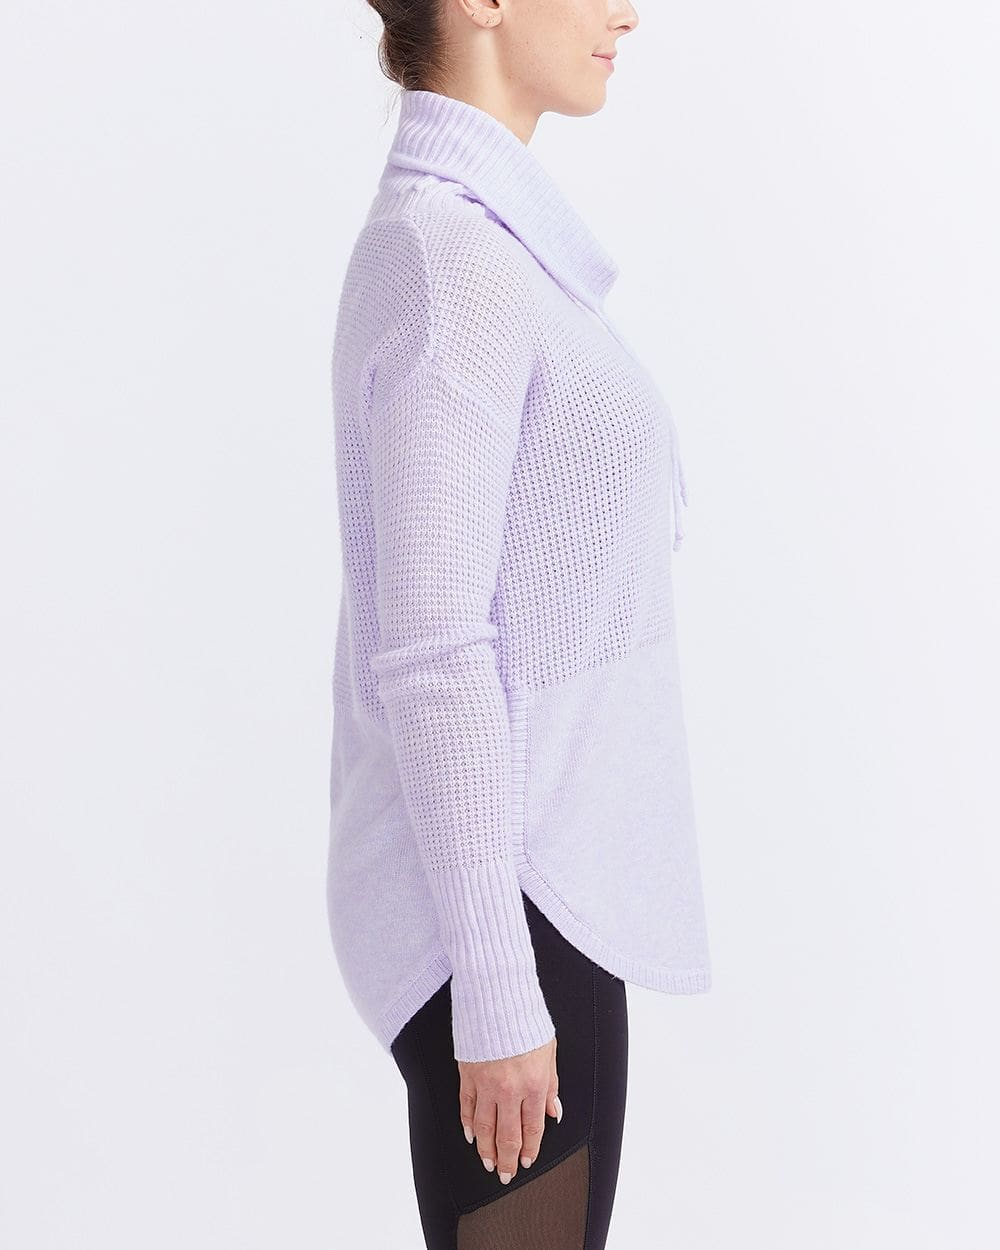 Hyba Cowl Neck Knit Sweater